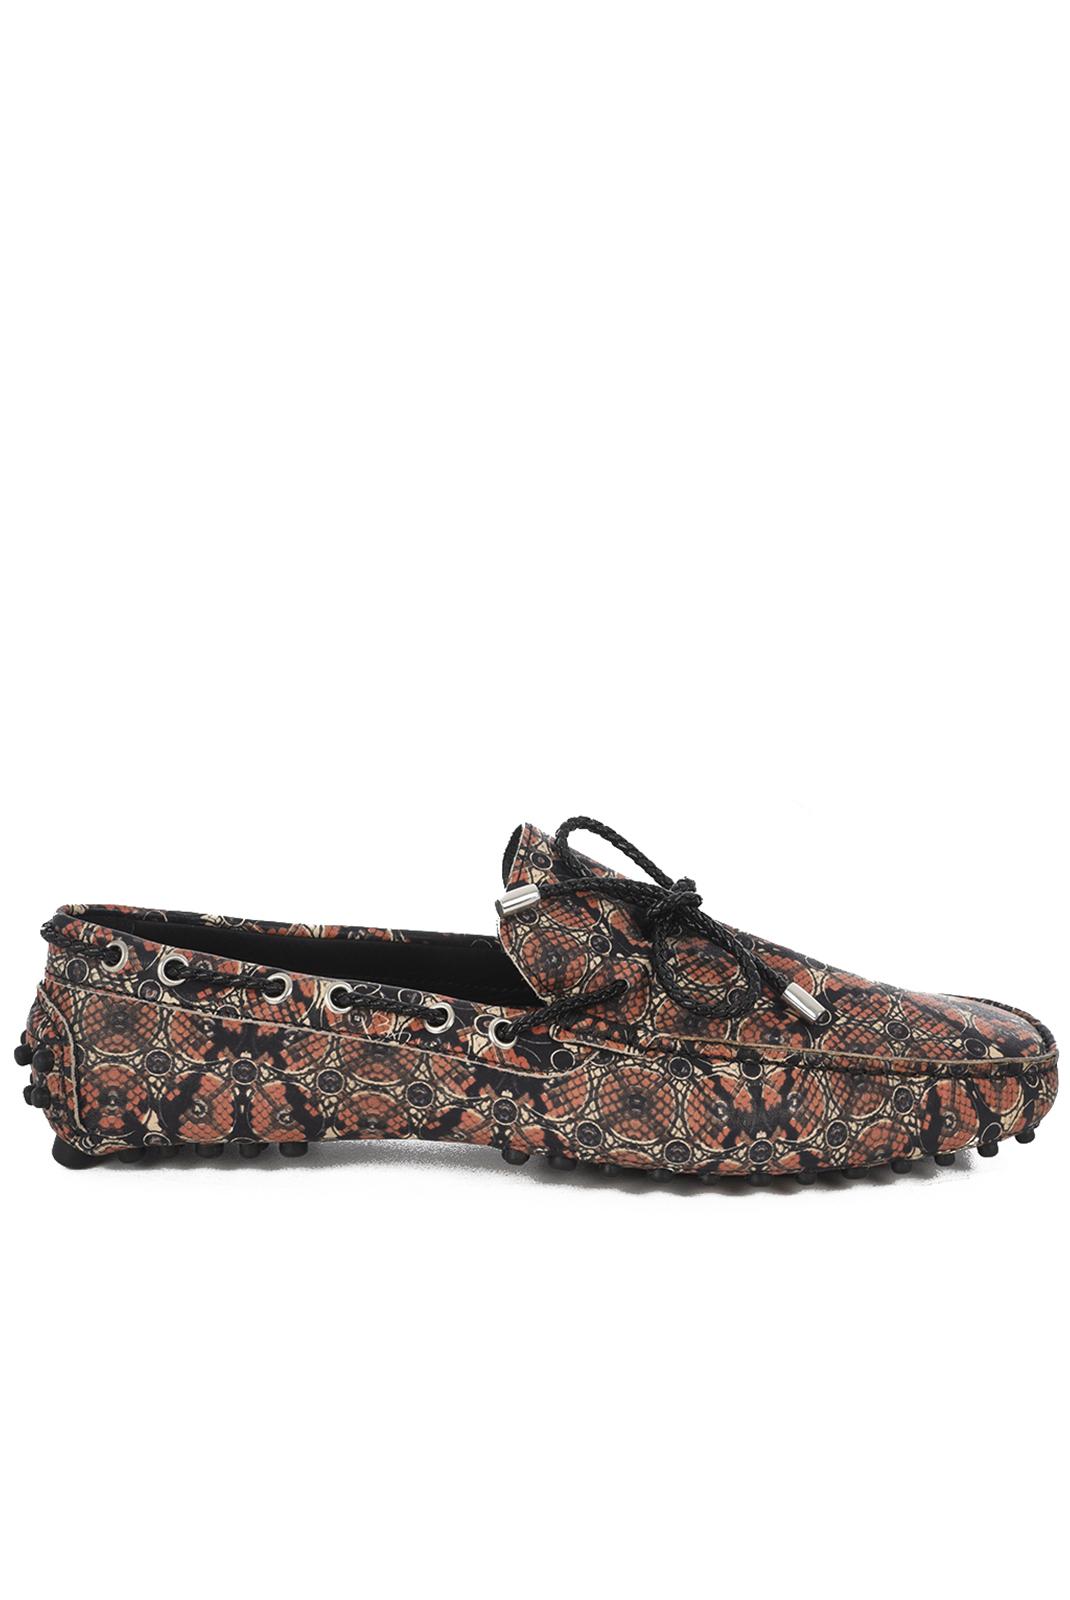 Chaussures de ville  Just Cavalli S12WR0035 (08580) 305S